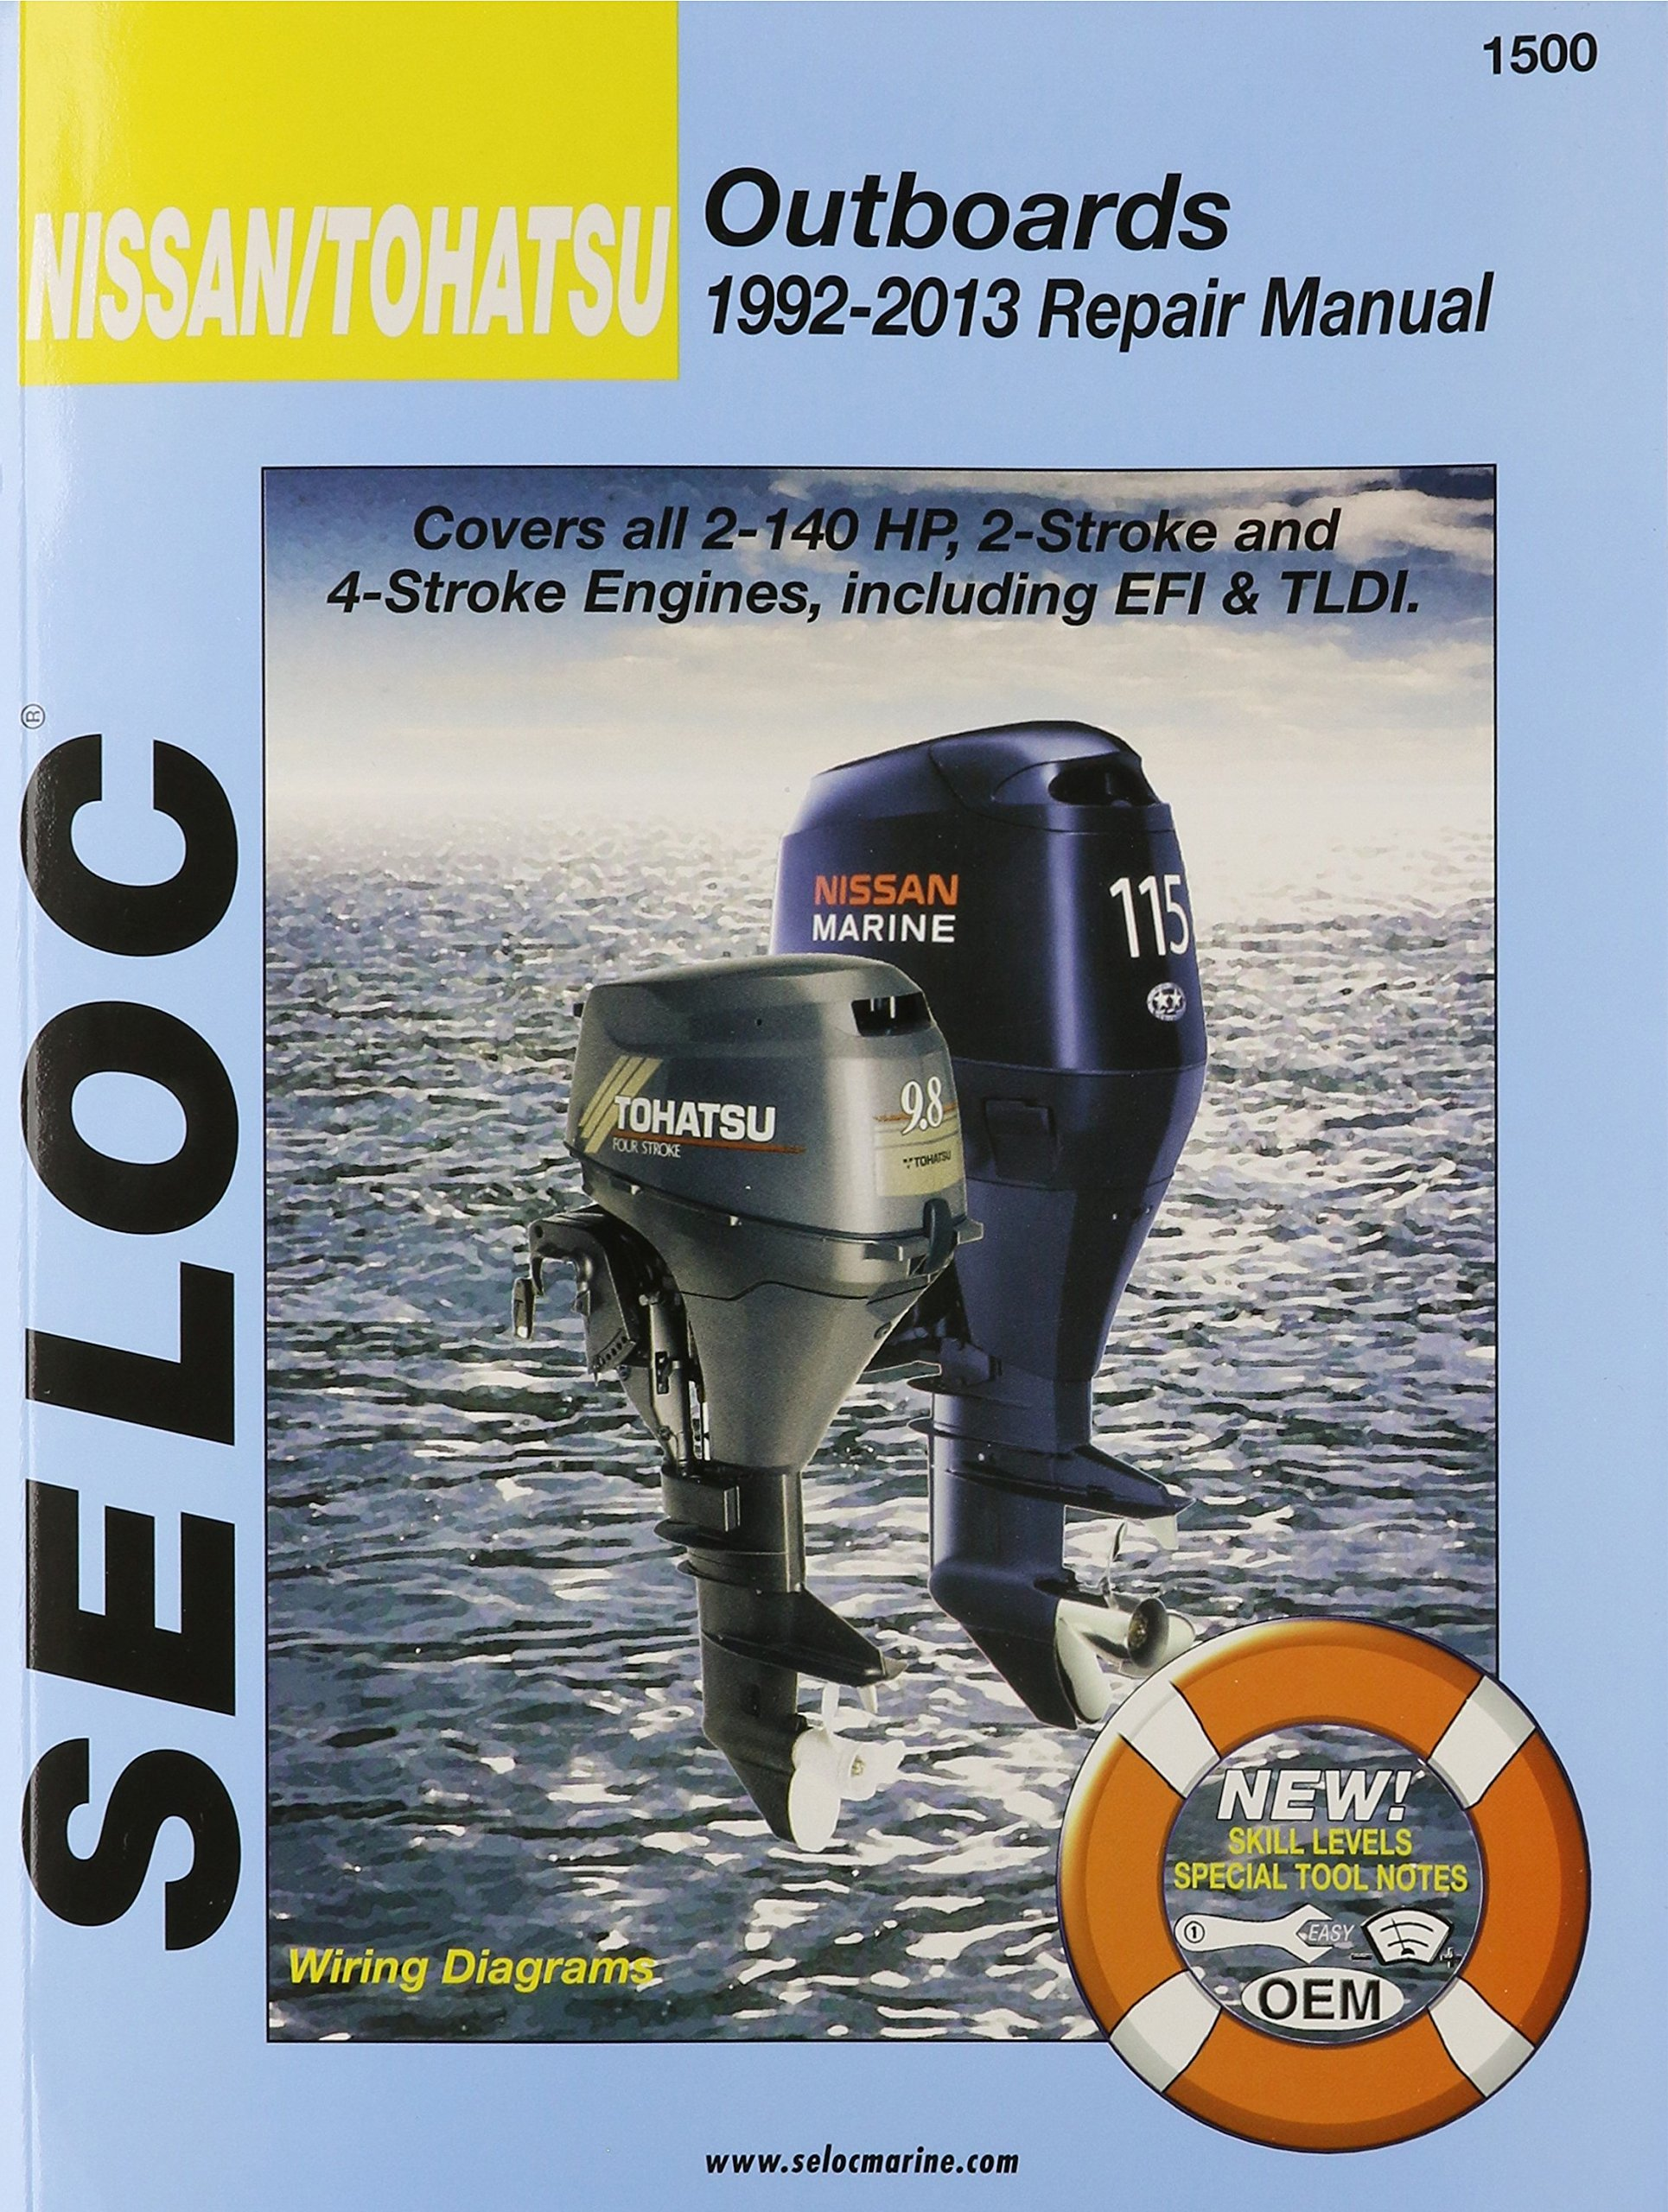 nissan tohatsu outboards 1992 13 repair manual all 2 stroke \u0026 4 Mercury Outboard Wiring Diagram